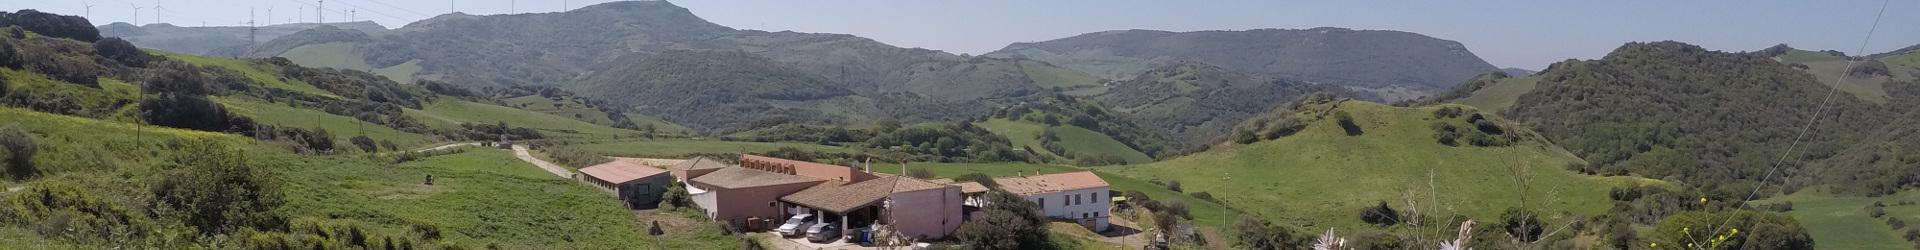 Agriturismo Sa Tanca Noa, tra le verdi colline di Tergu (Sassari)